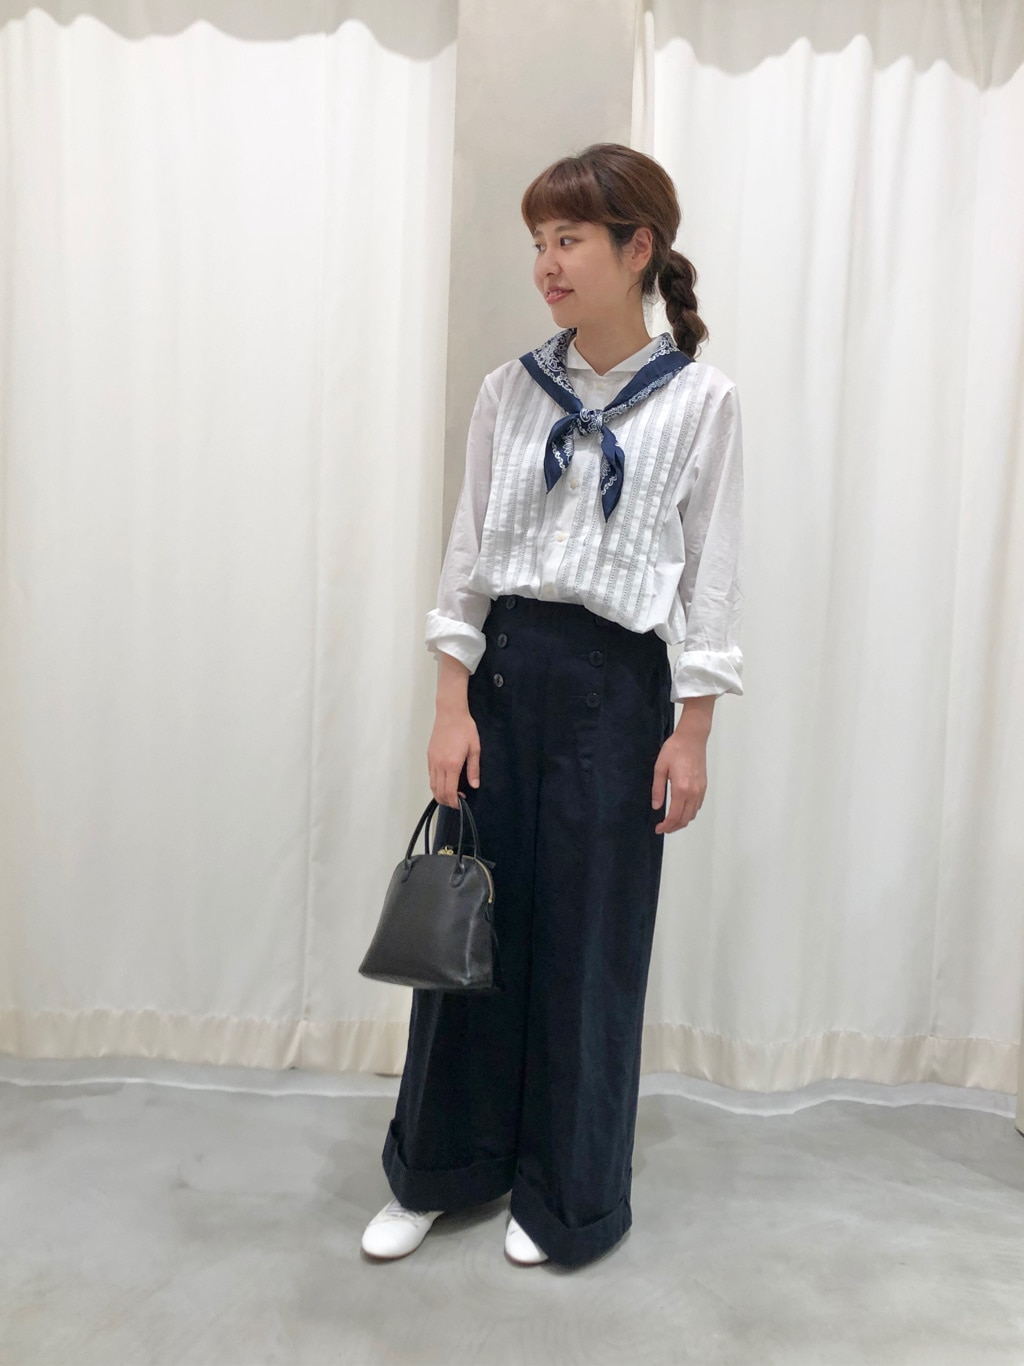 - CHILD WOMAN CHILD WOMAN , PAR ICI 東京スカイツリータウン・ソラマチ 身長:160cm 2020.08.31